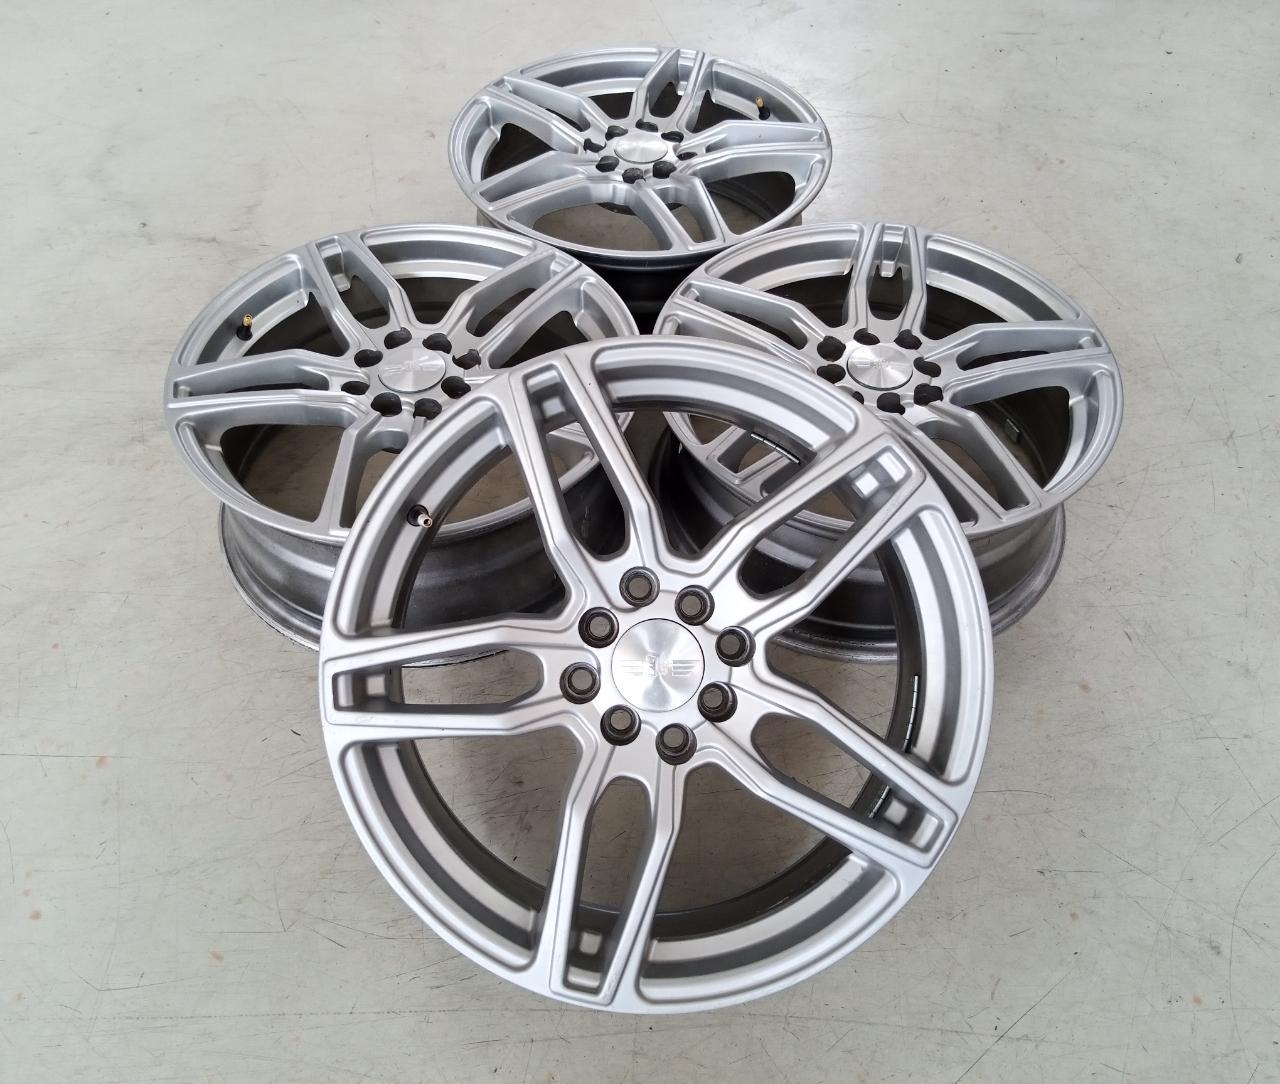 Velg Bekas Model Conquista Ring 17×7 ET:40 H:8×100+114,3 Silver